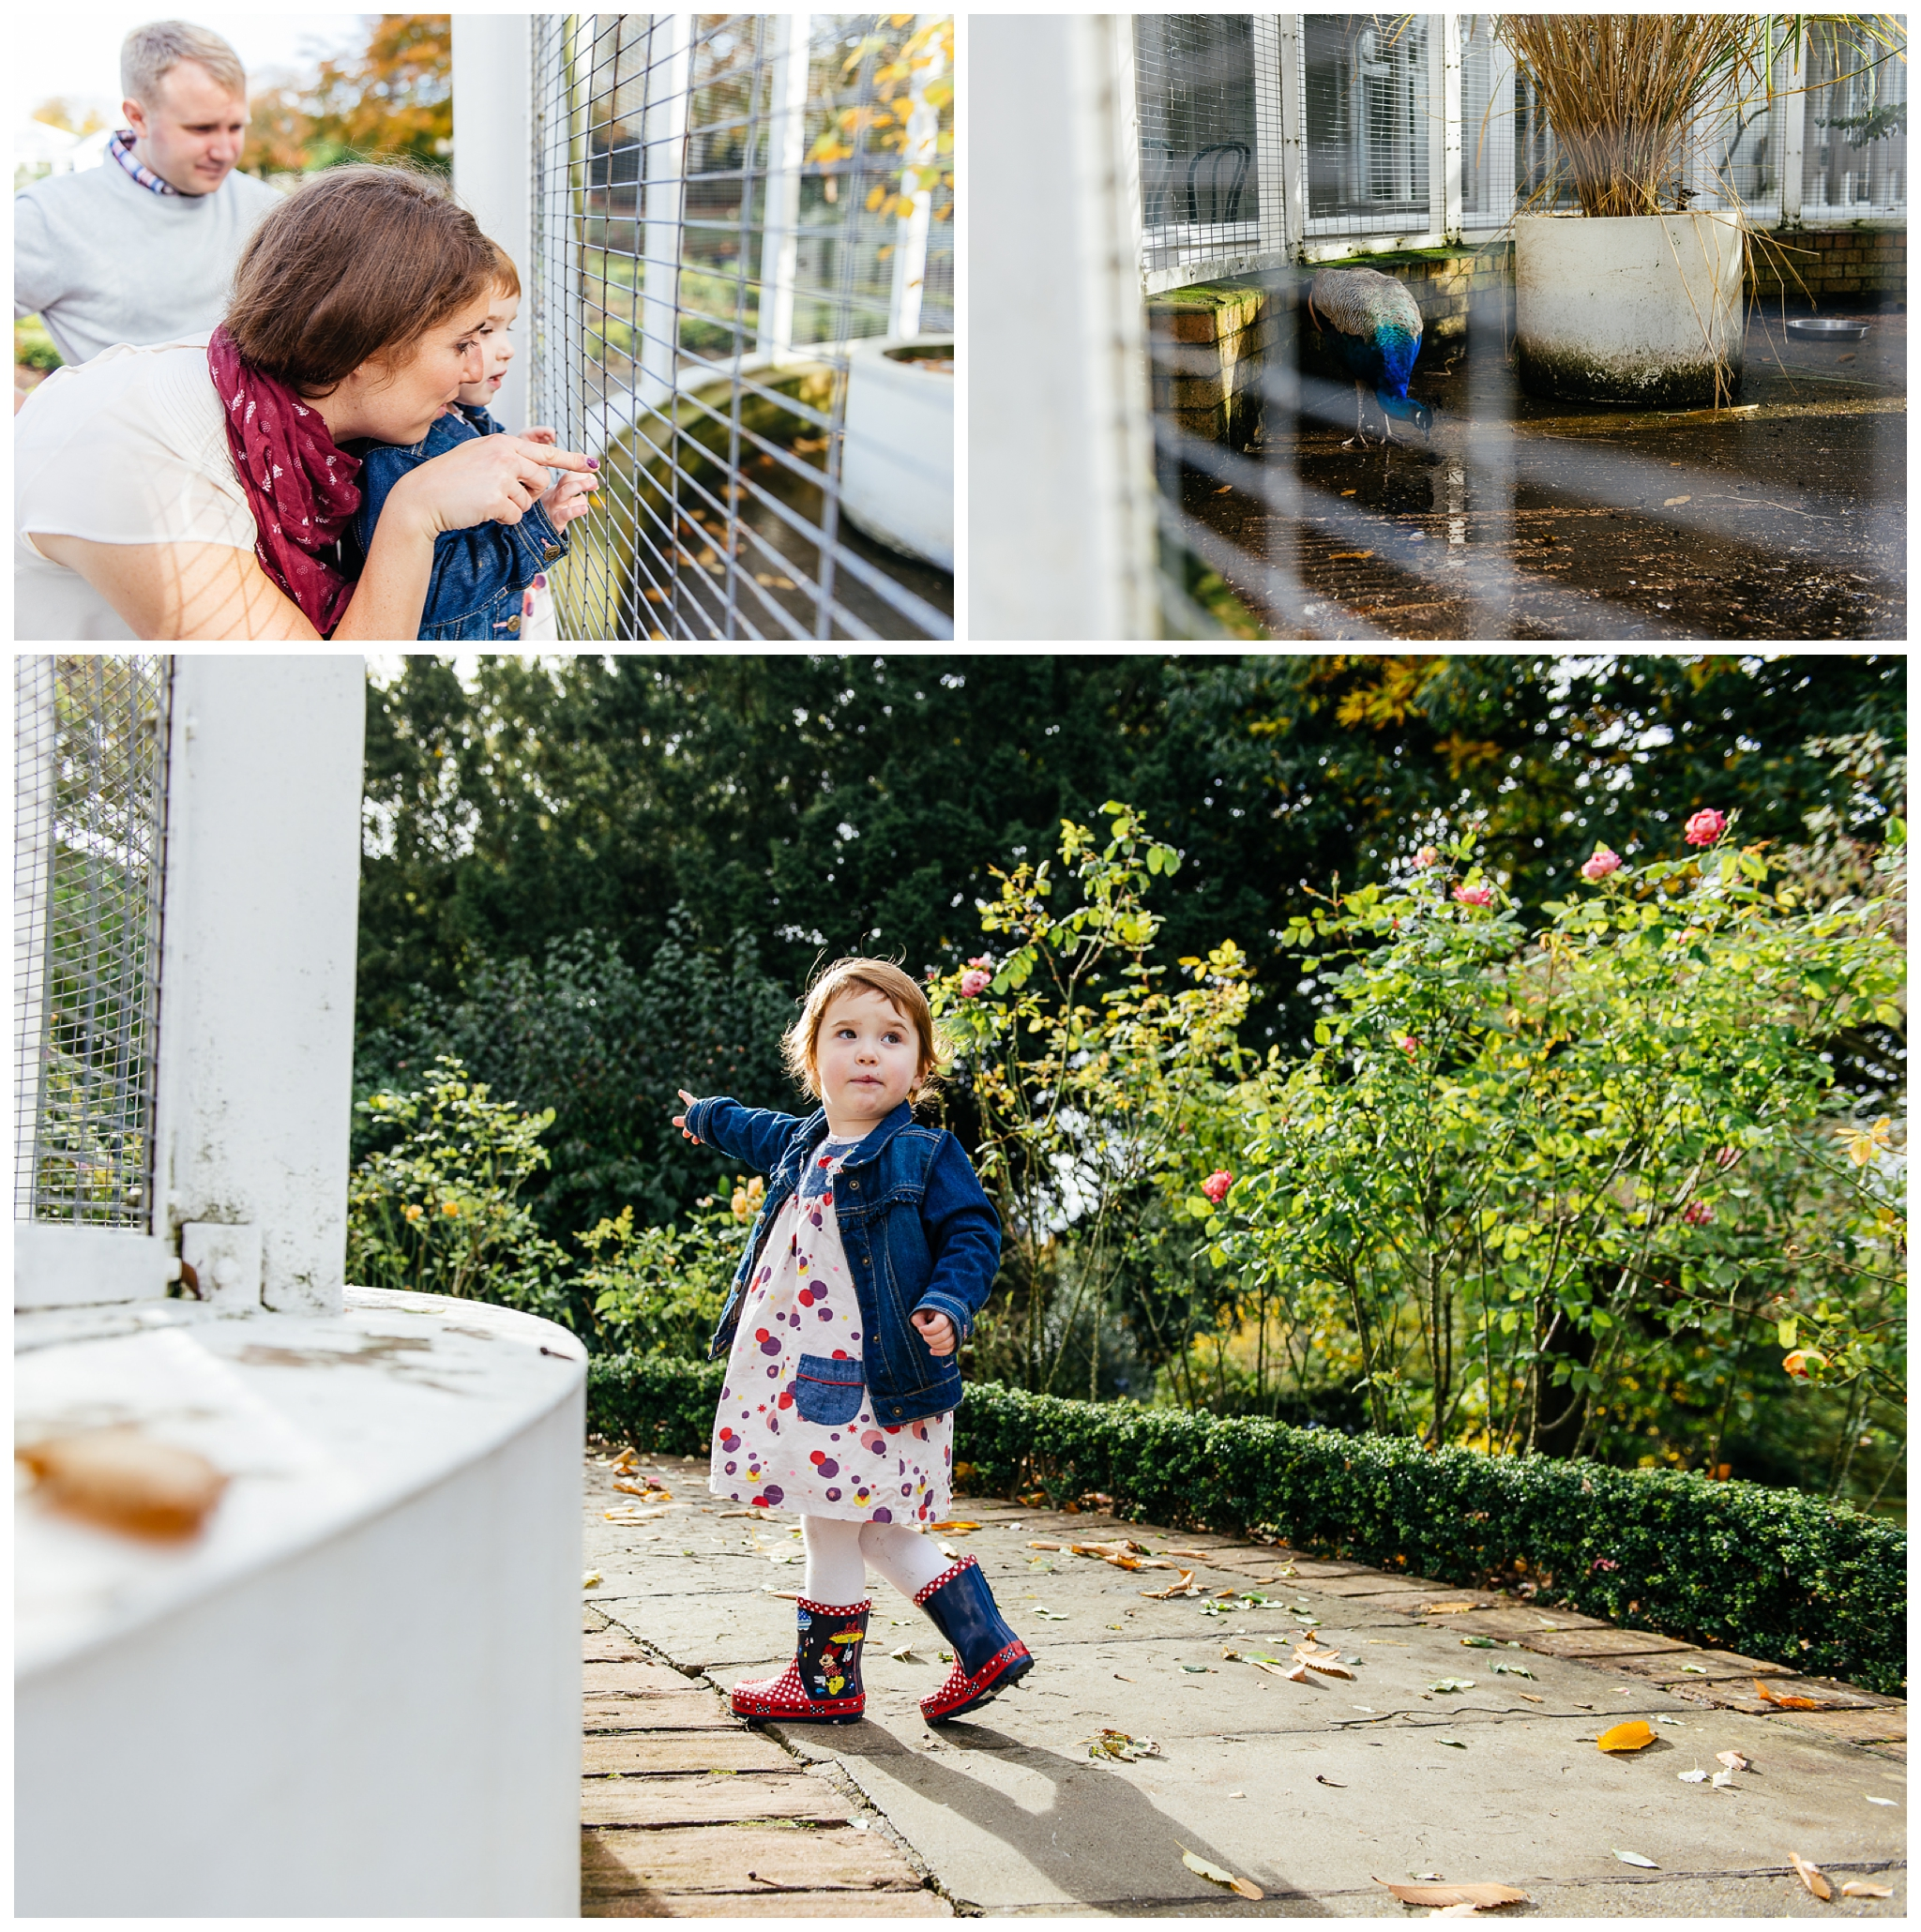 Autumn-family-portraits-birmingham-photographer_0028.jpg